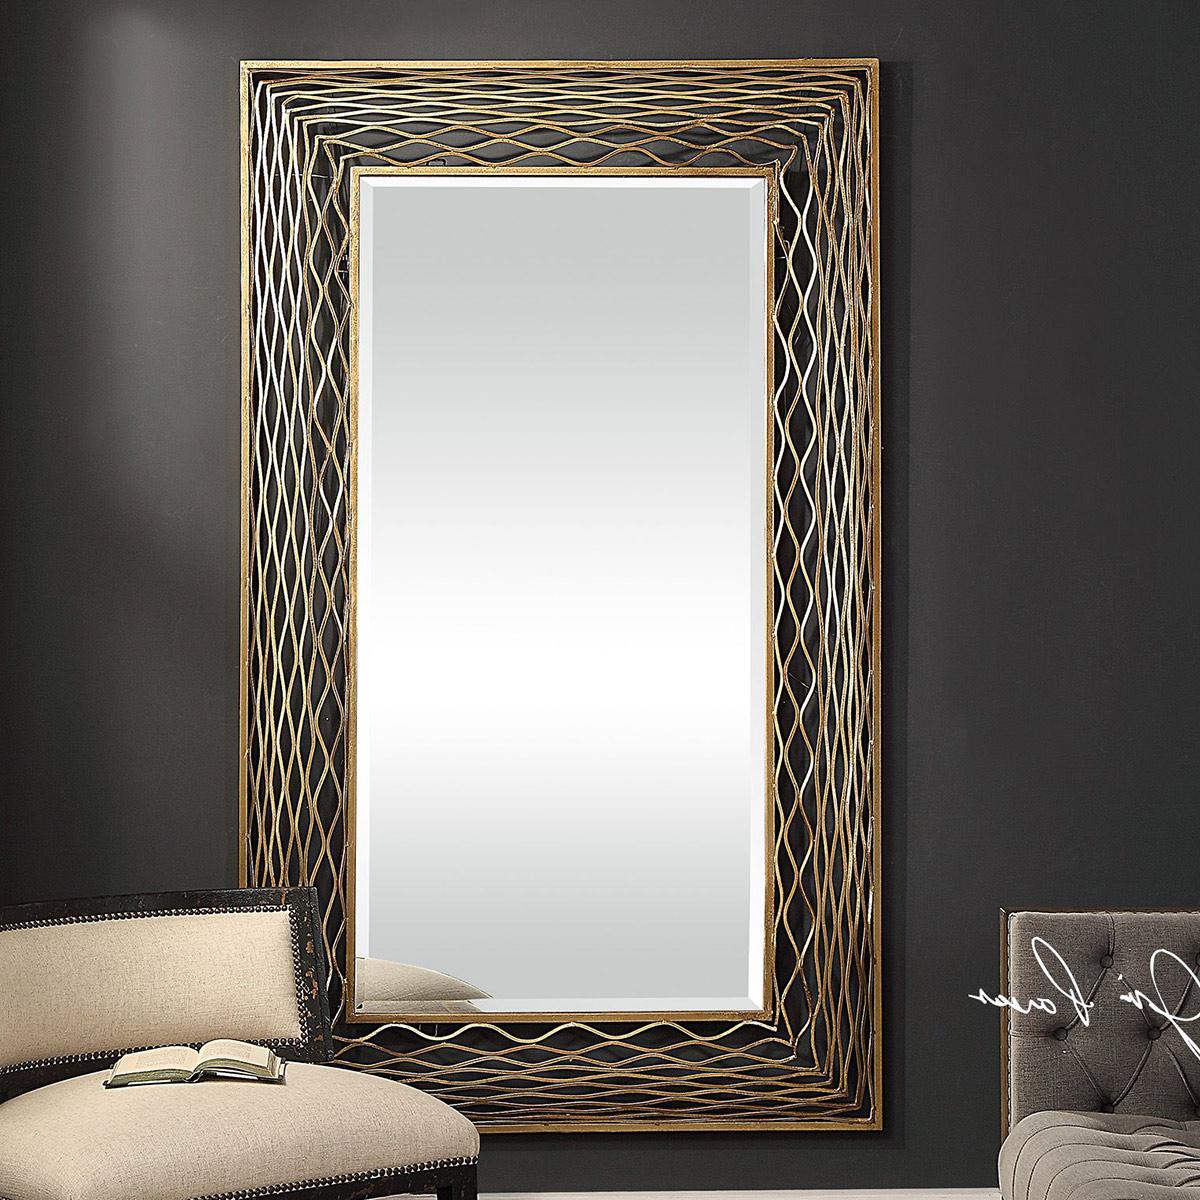 Coastal Mirrors: Galtero Gold Wall Mirror Pertaining To Trendy Coastal Style Wall Mirrors (View 11 of 20)